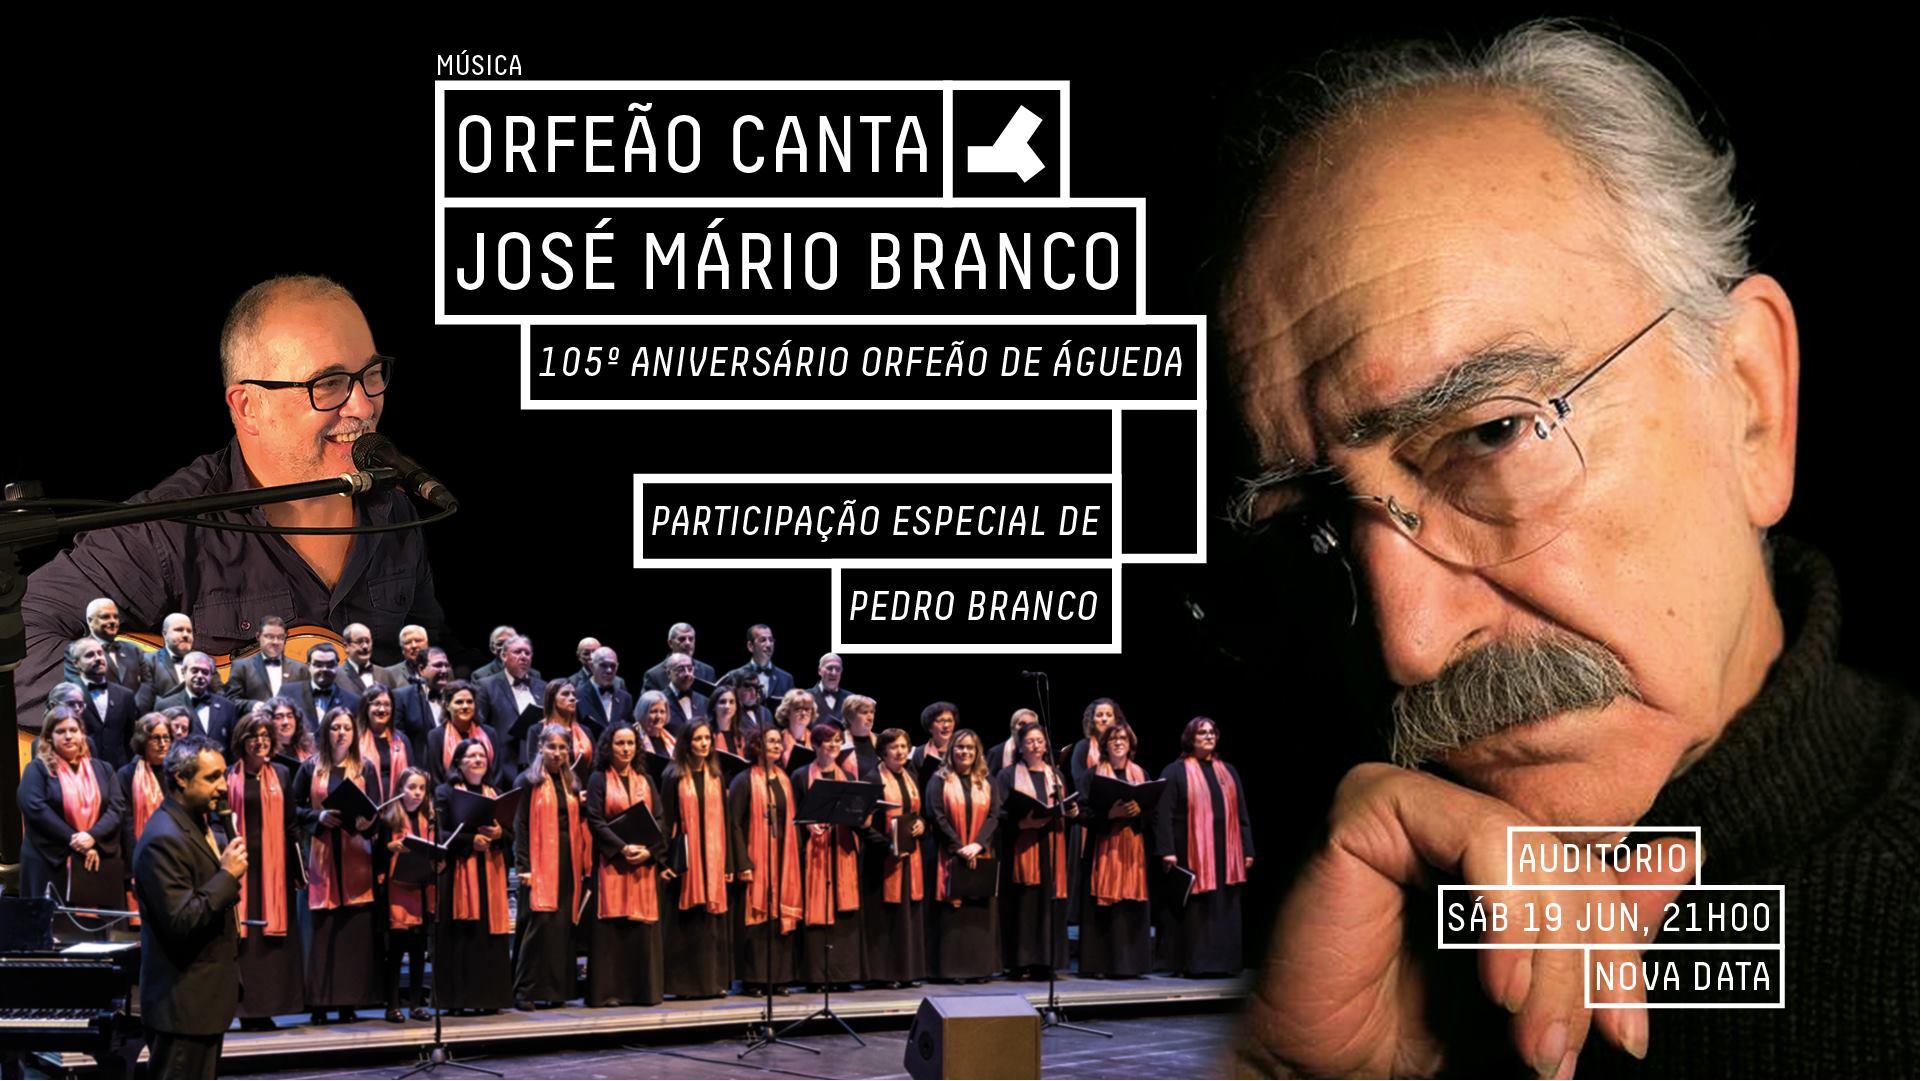 Orfeão canta José Mário Branco - Nova Data